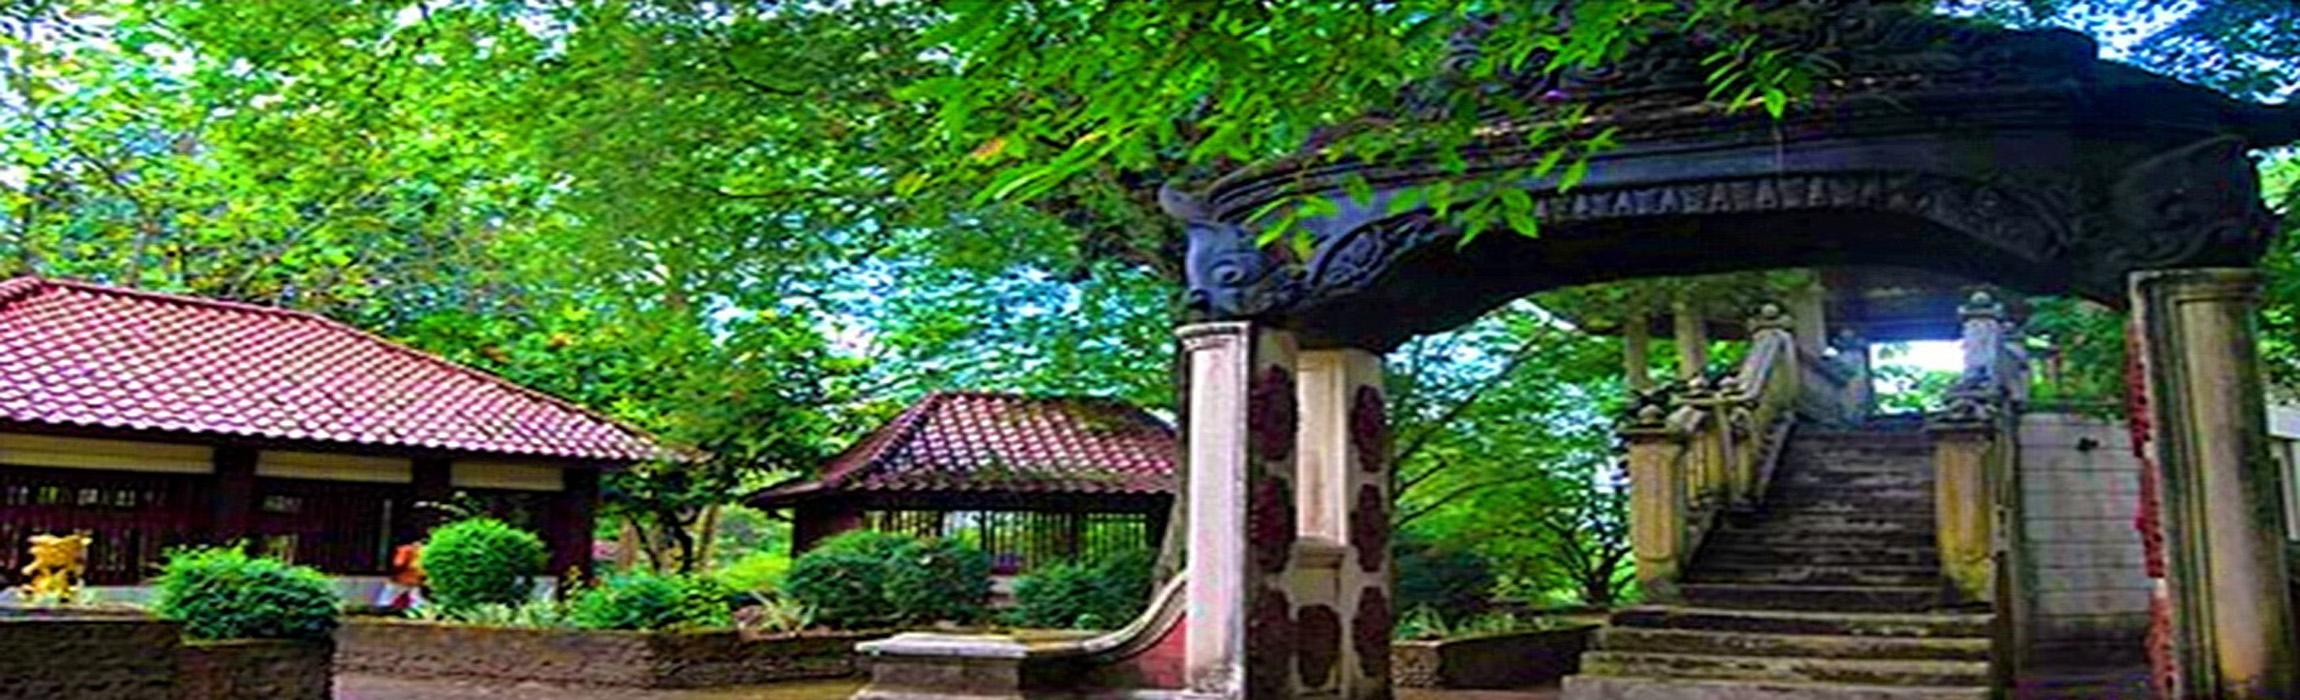 8 Tempat Wisata Palembang Wajib Dikunjungi Bukit Siguntang Kota